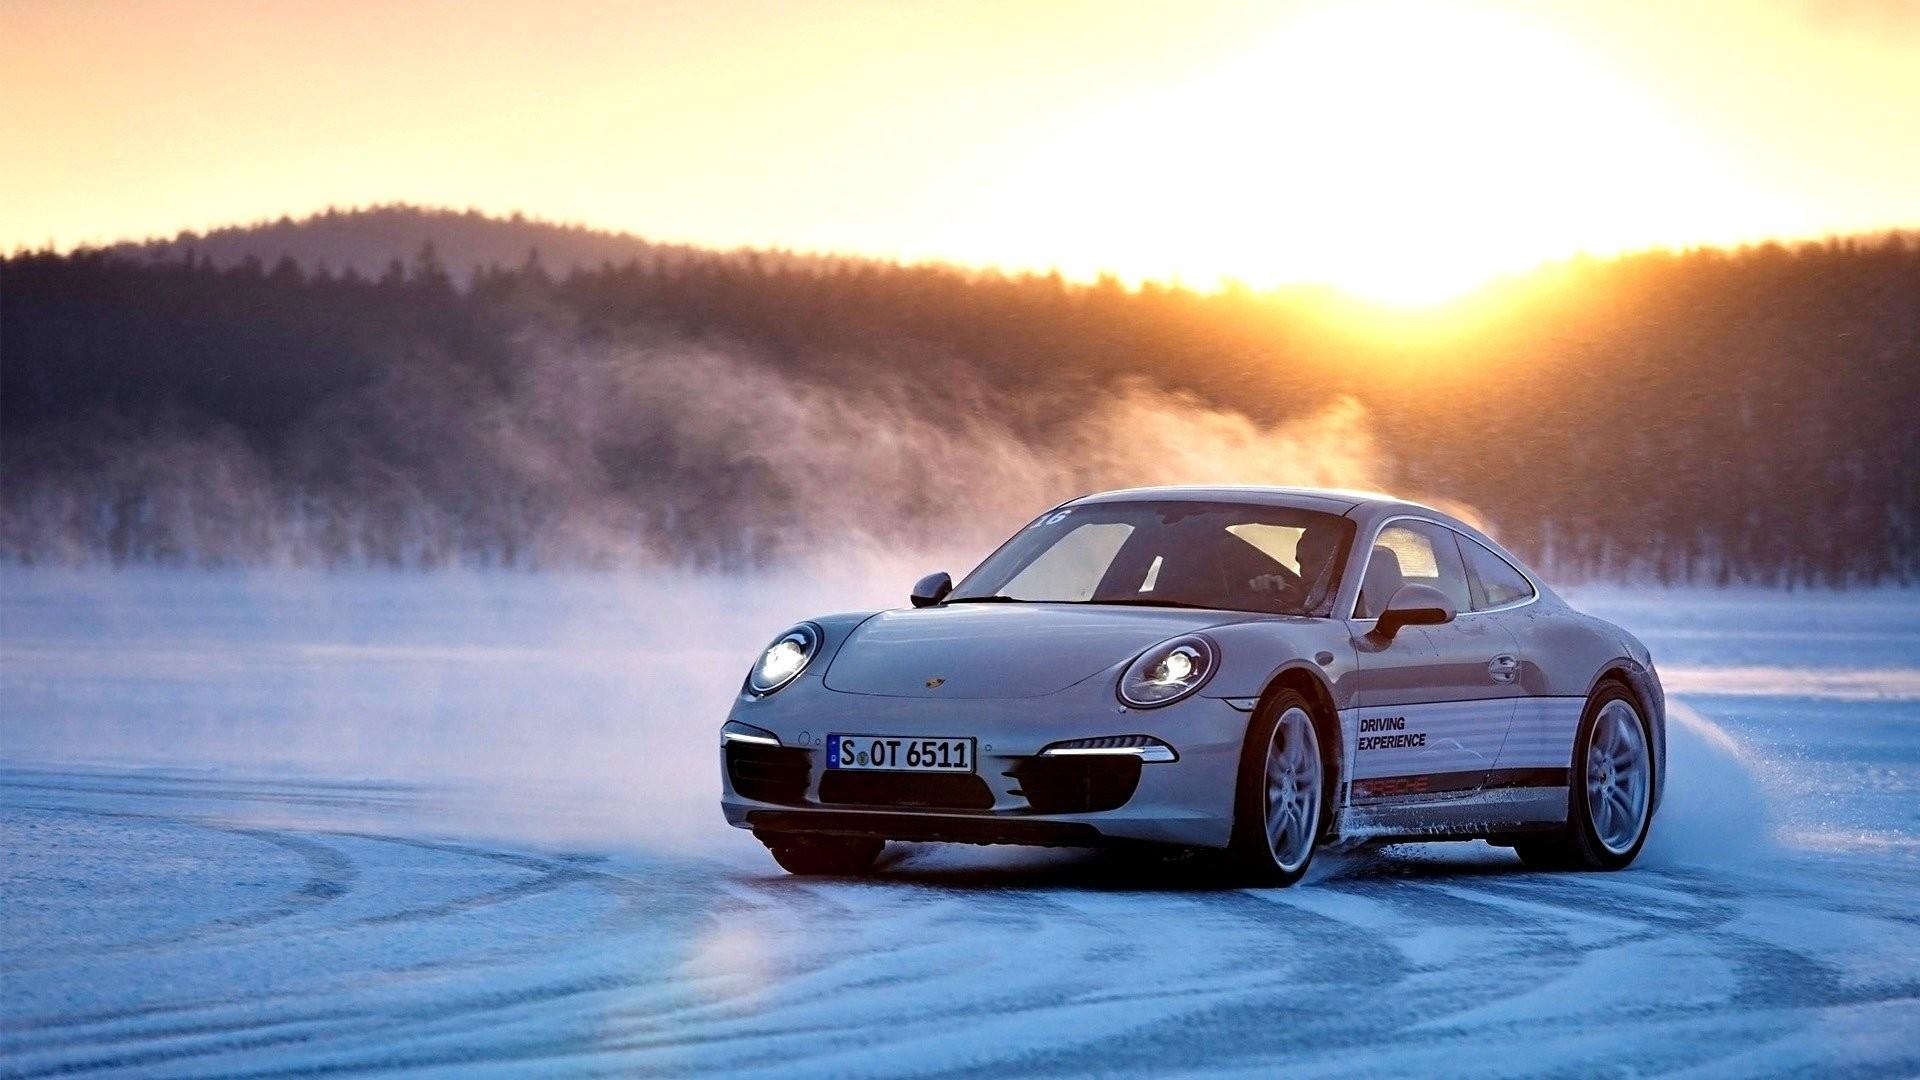 1920x1080 Vehicles   Porsche 911 Turbo Wallpaper